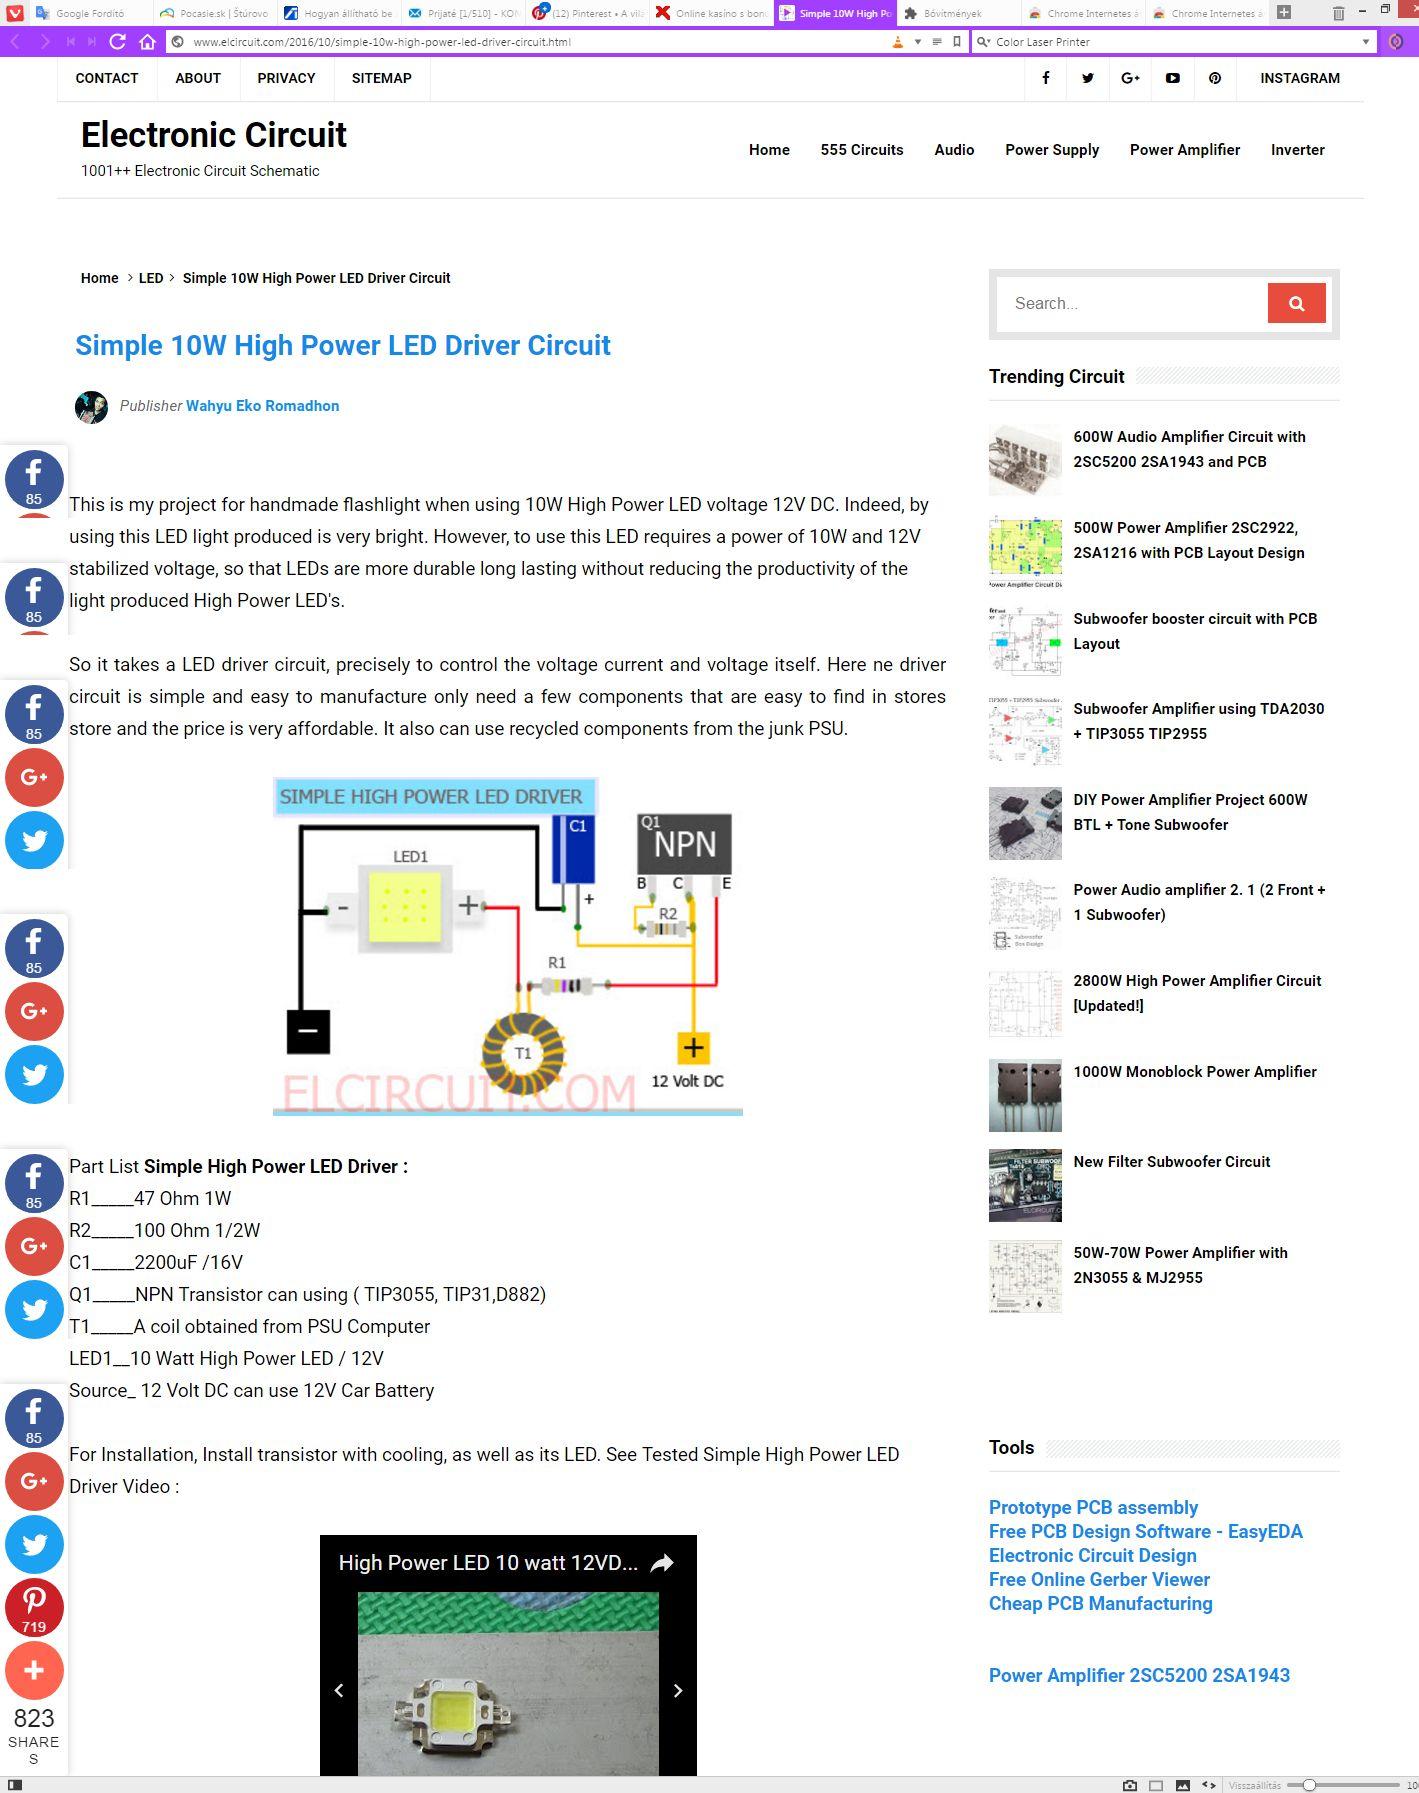 Pin By Mikorka Kalman On Kapcsolsok Pinterest Simple High Power Inverter 2n3055